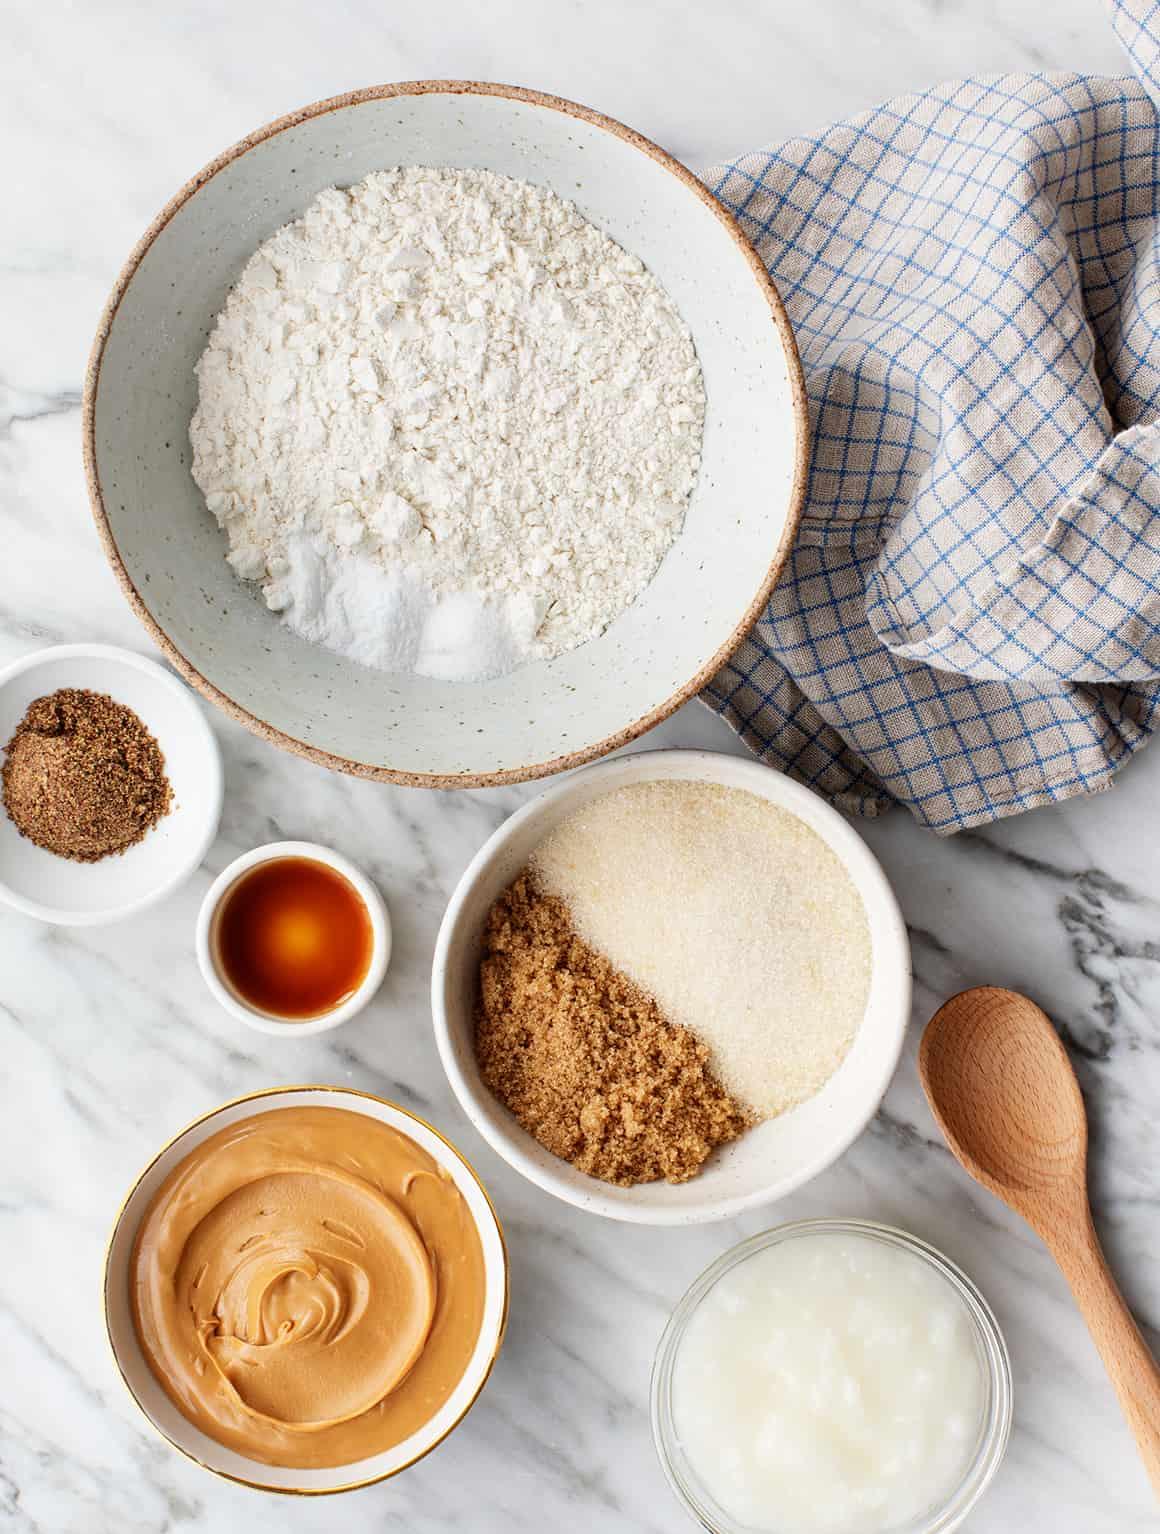 Peanut butter cookie recipe ingredients